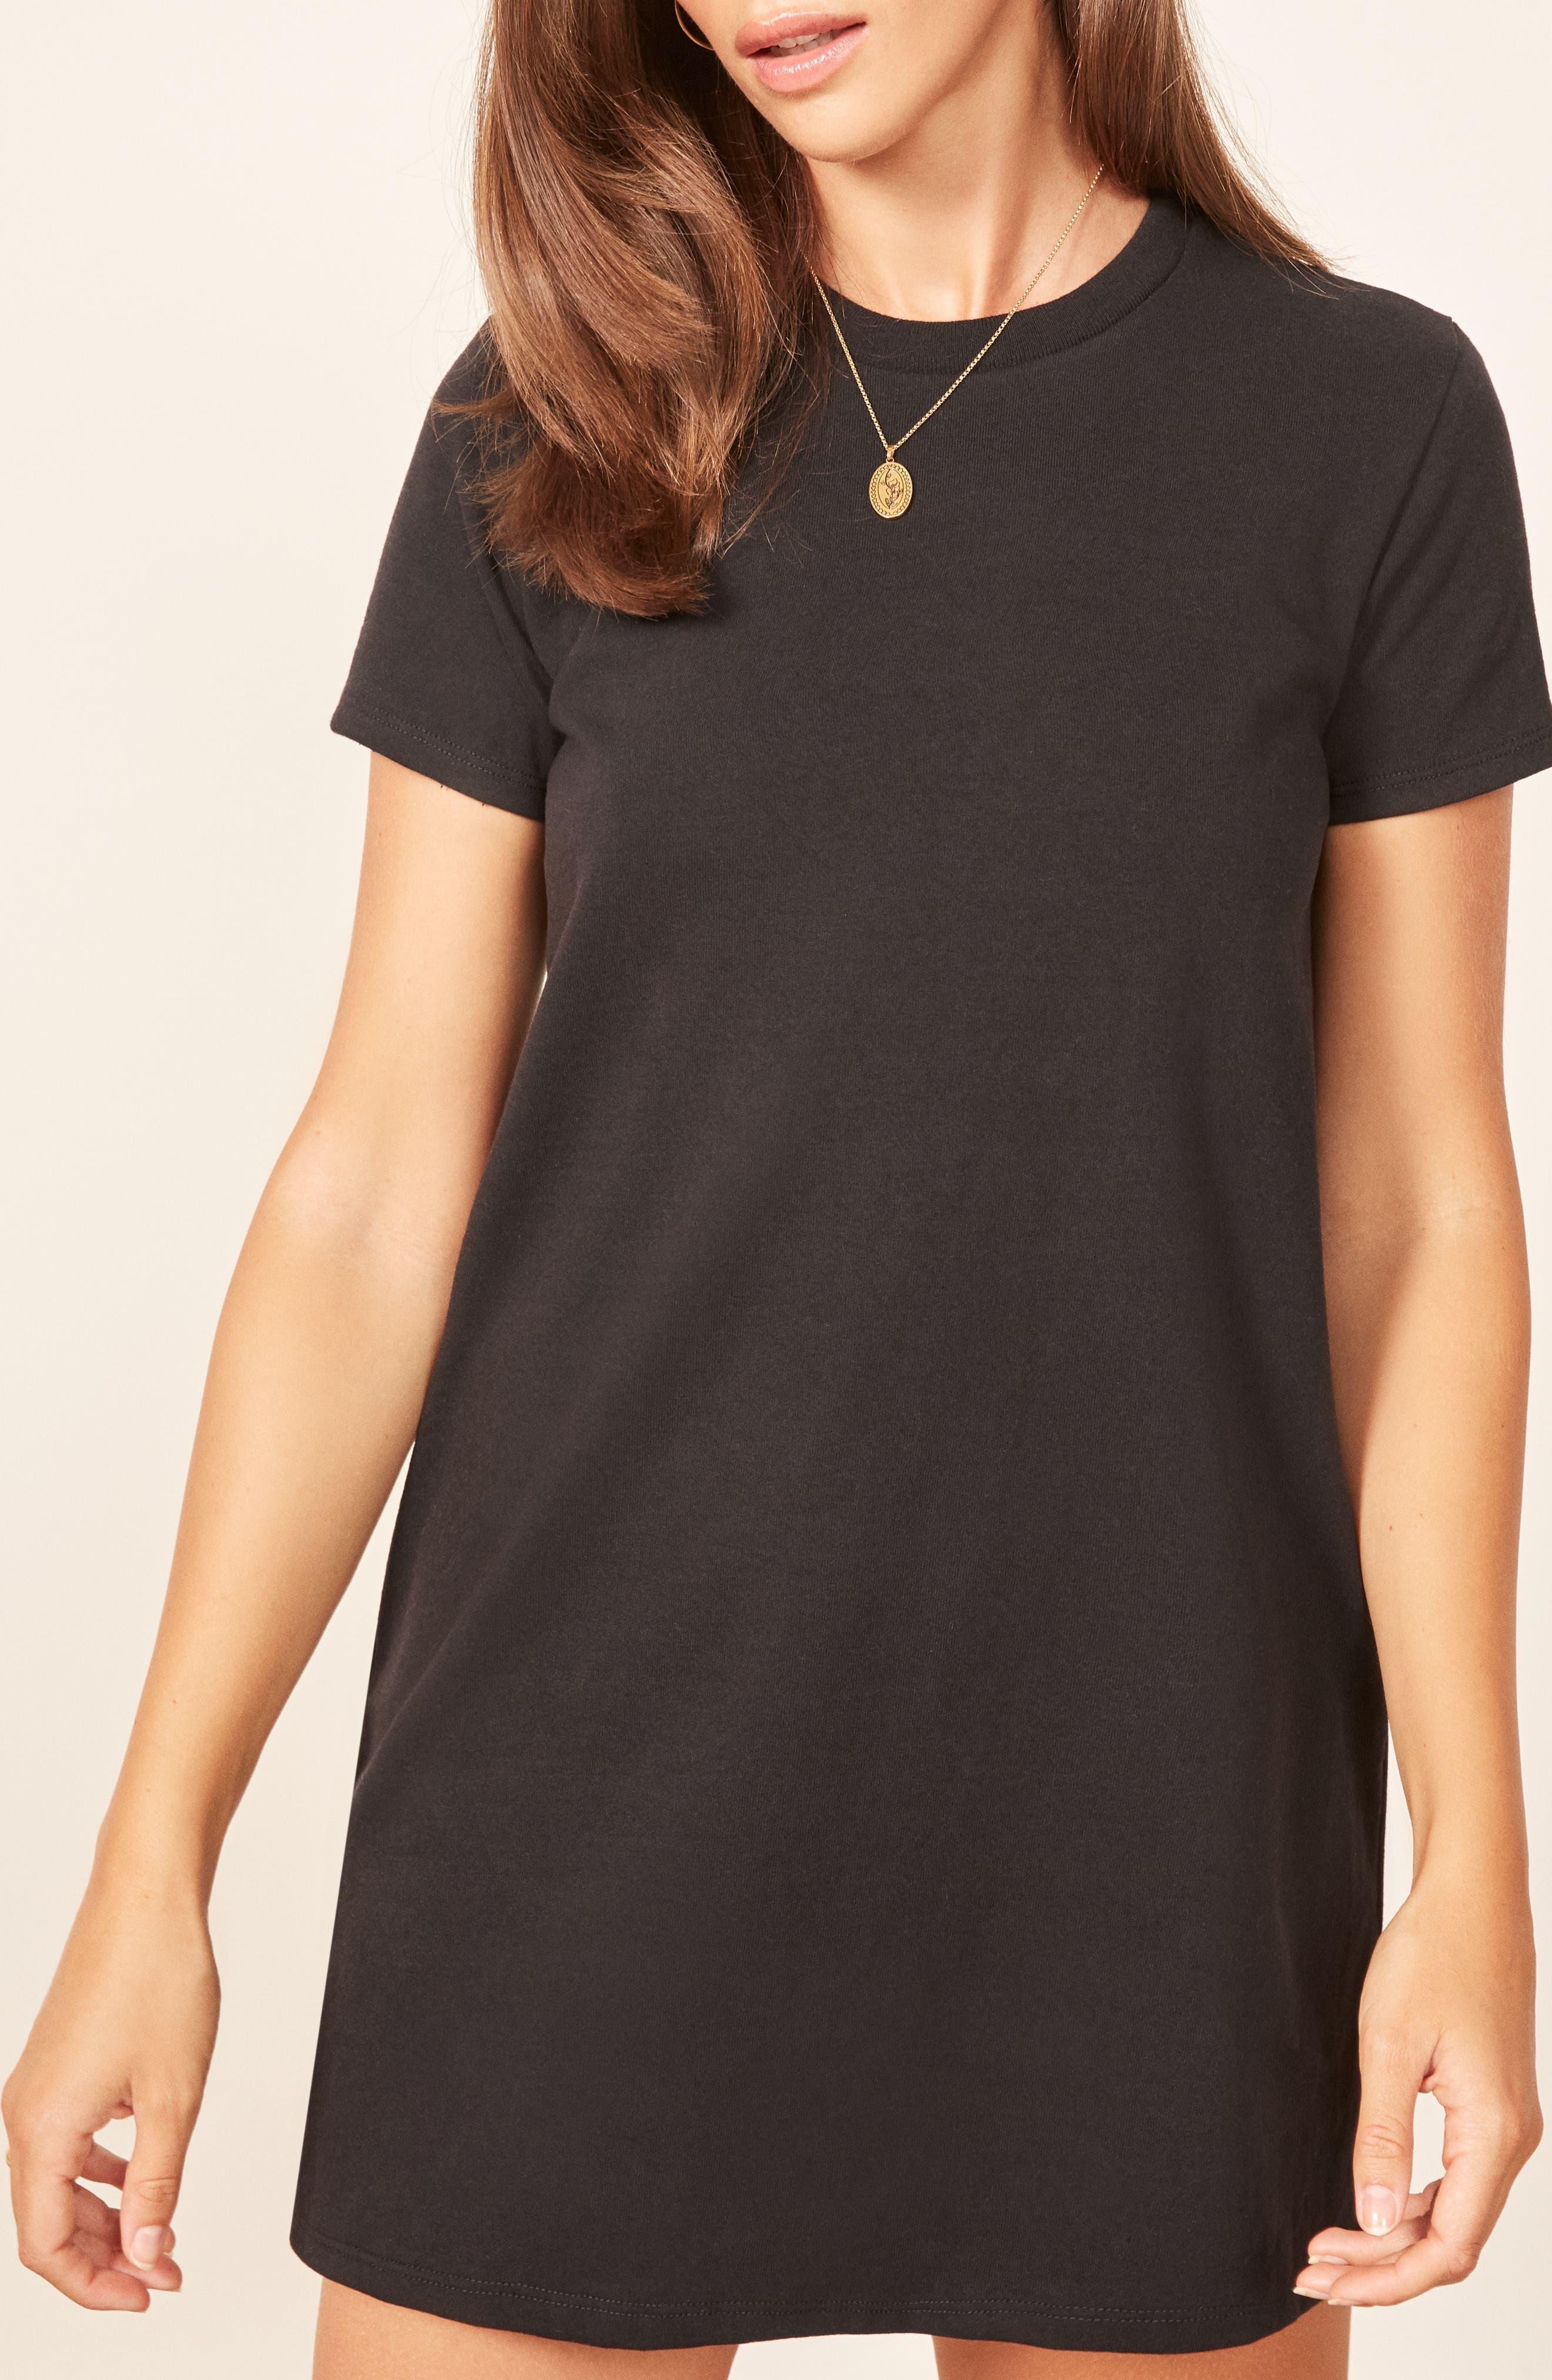 Damien T-Shirt Dress,                             Alternate thumbnail 4, color,                             001